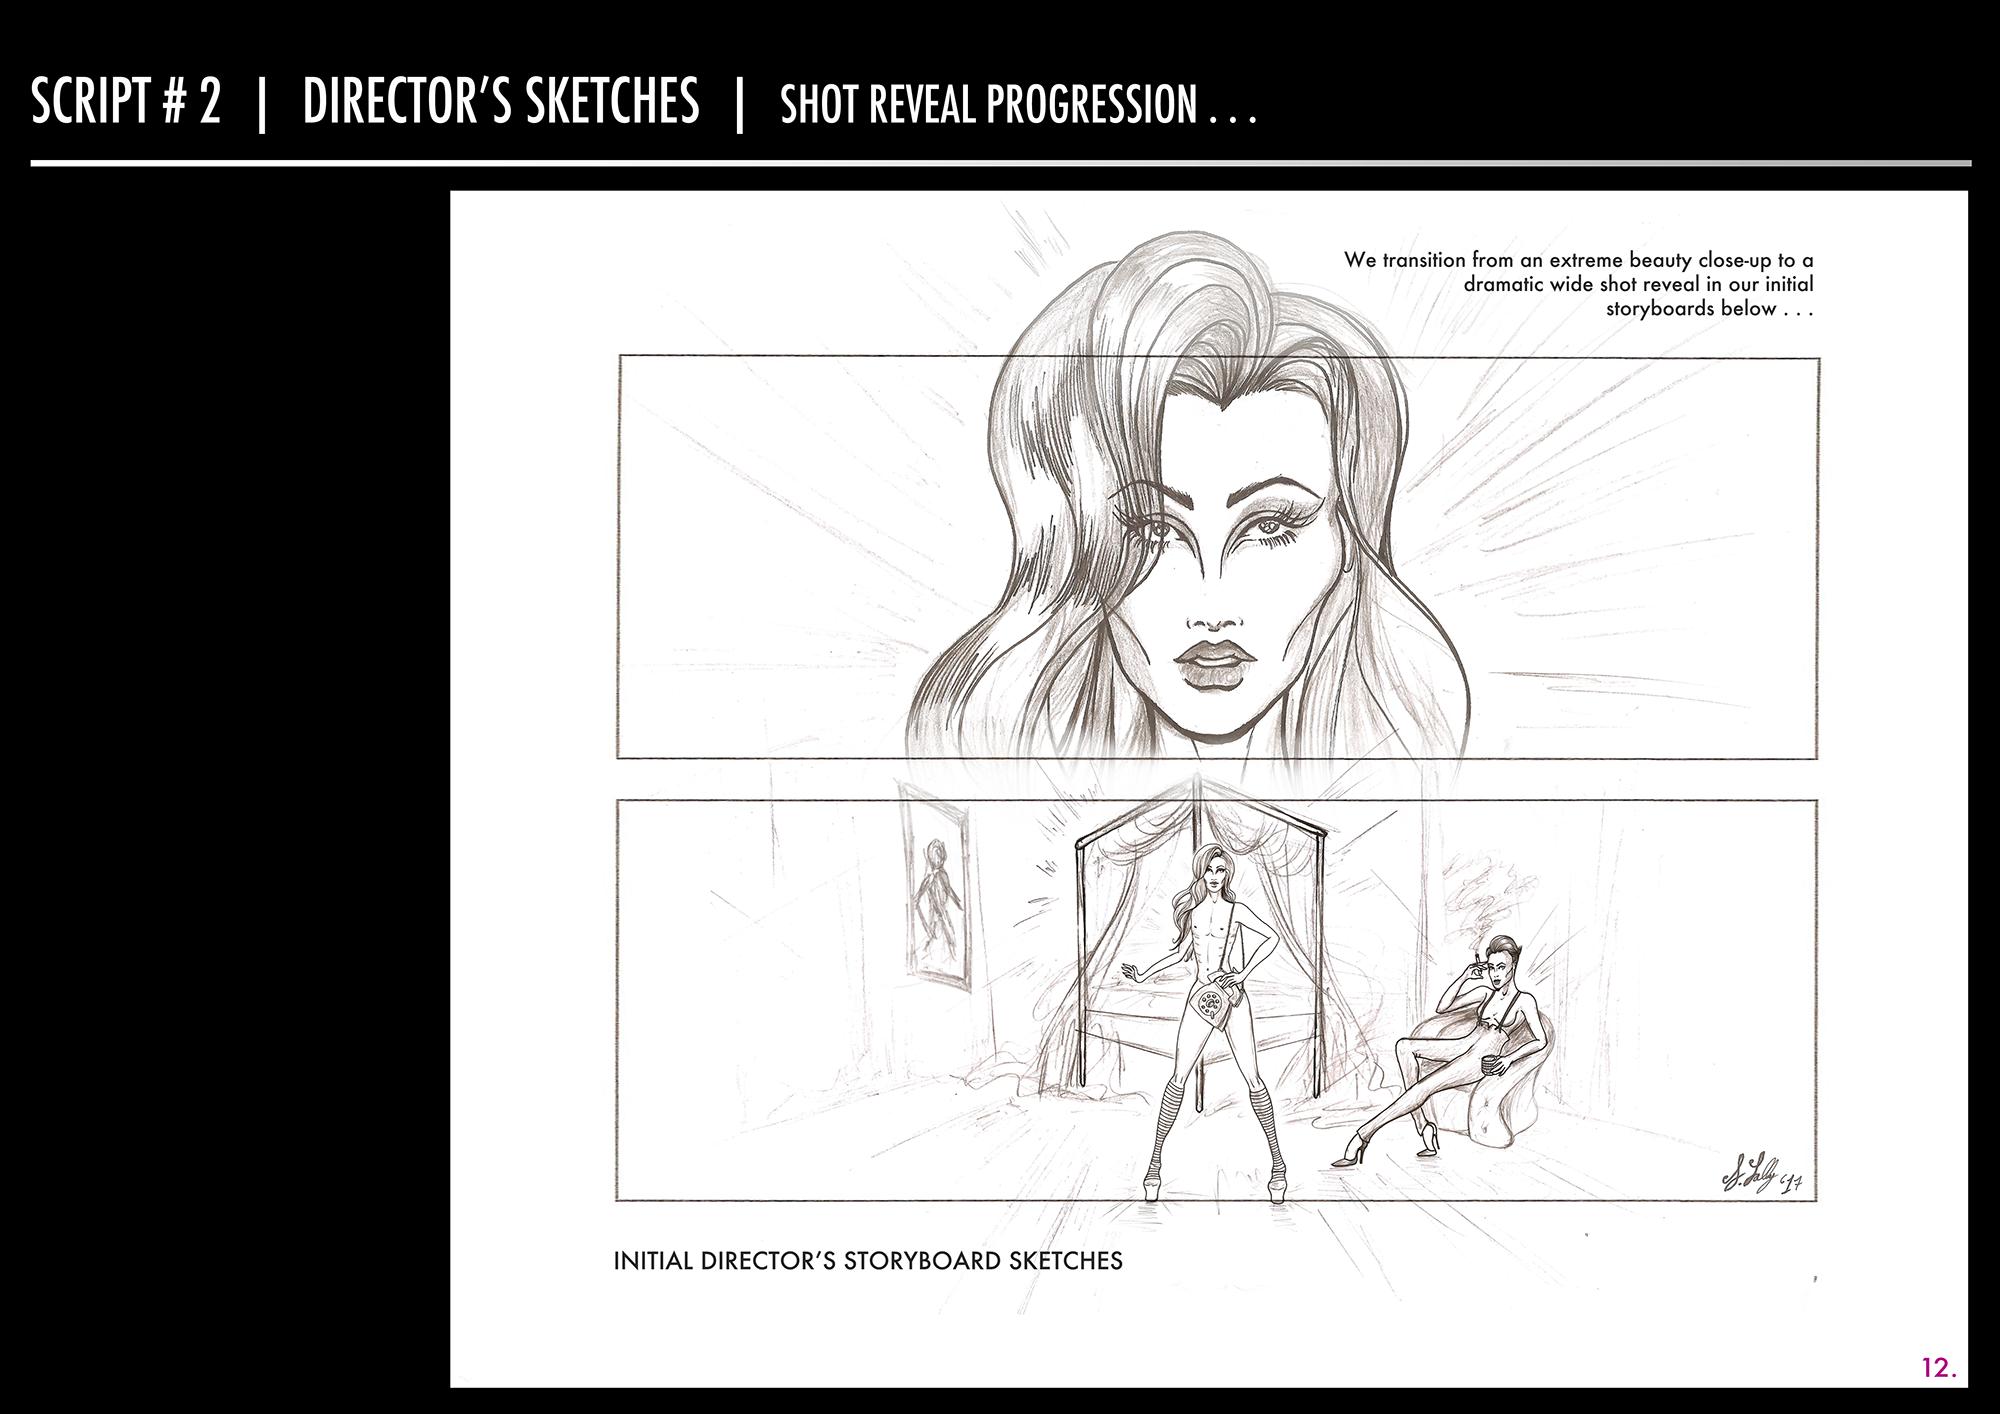 stephen_lally_storyboard_artwork_04.png